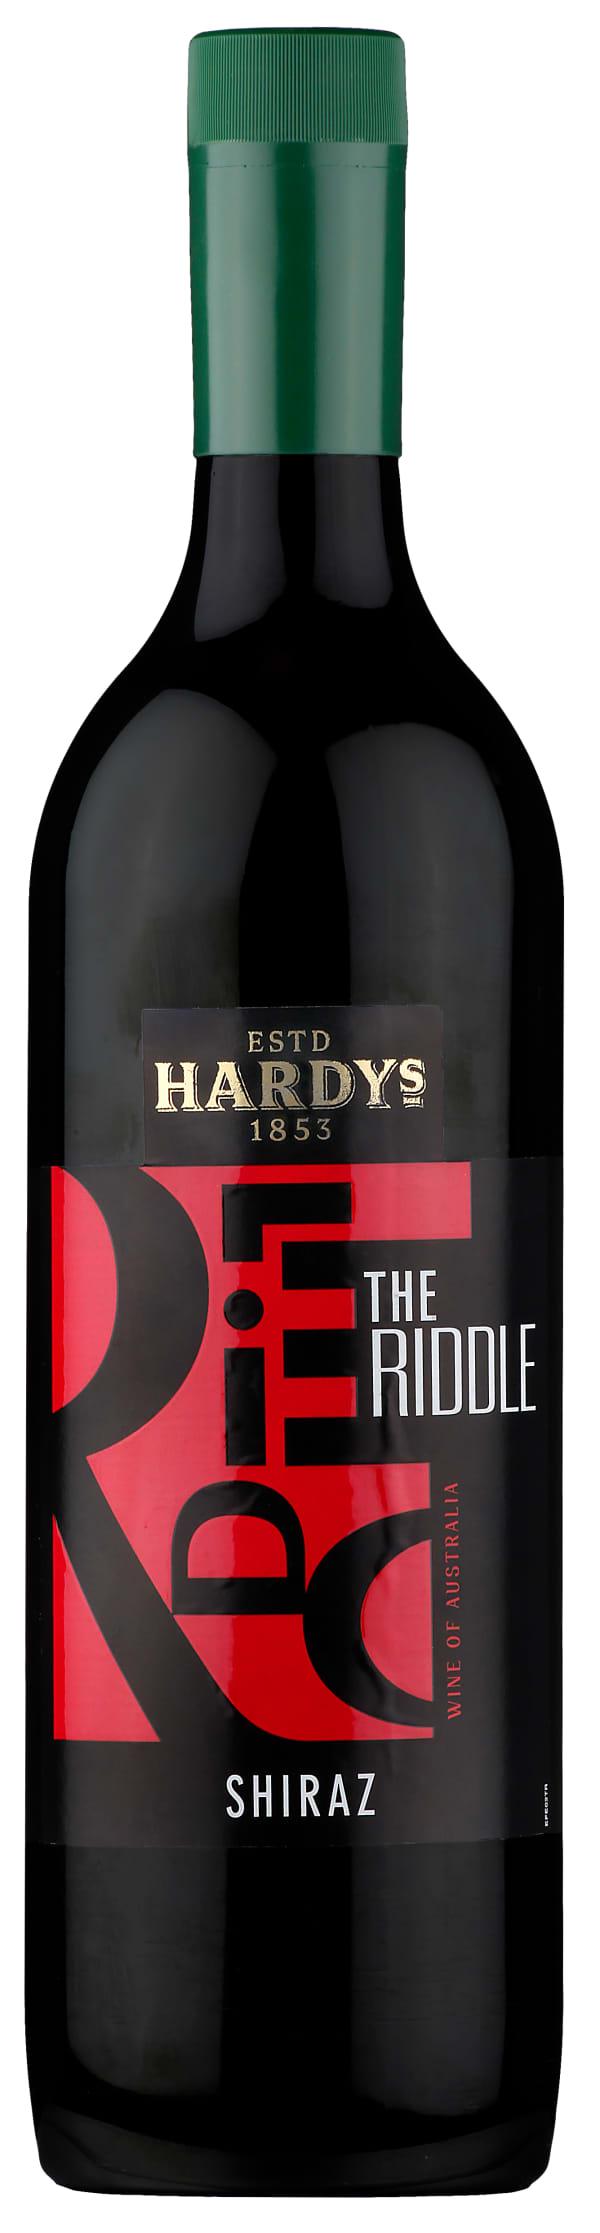 Hardys The Riddle Shiraz 2016 muovipullo